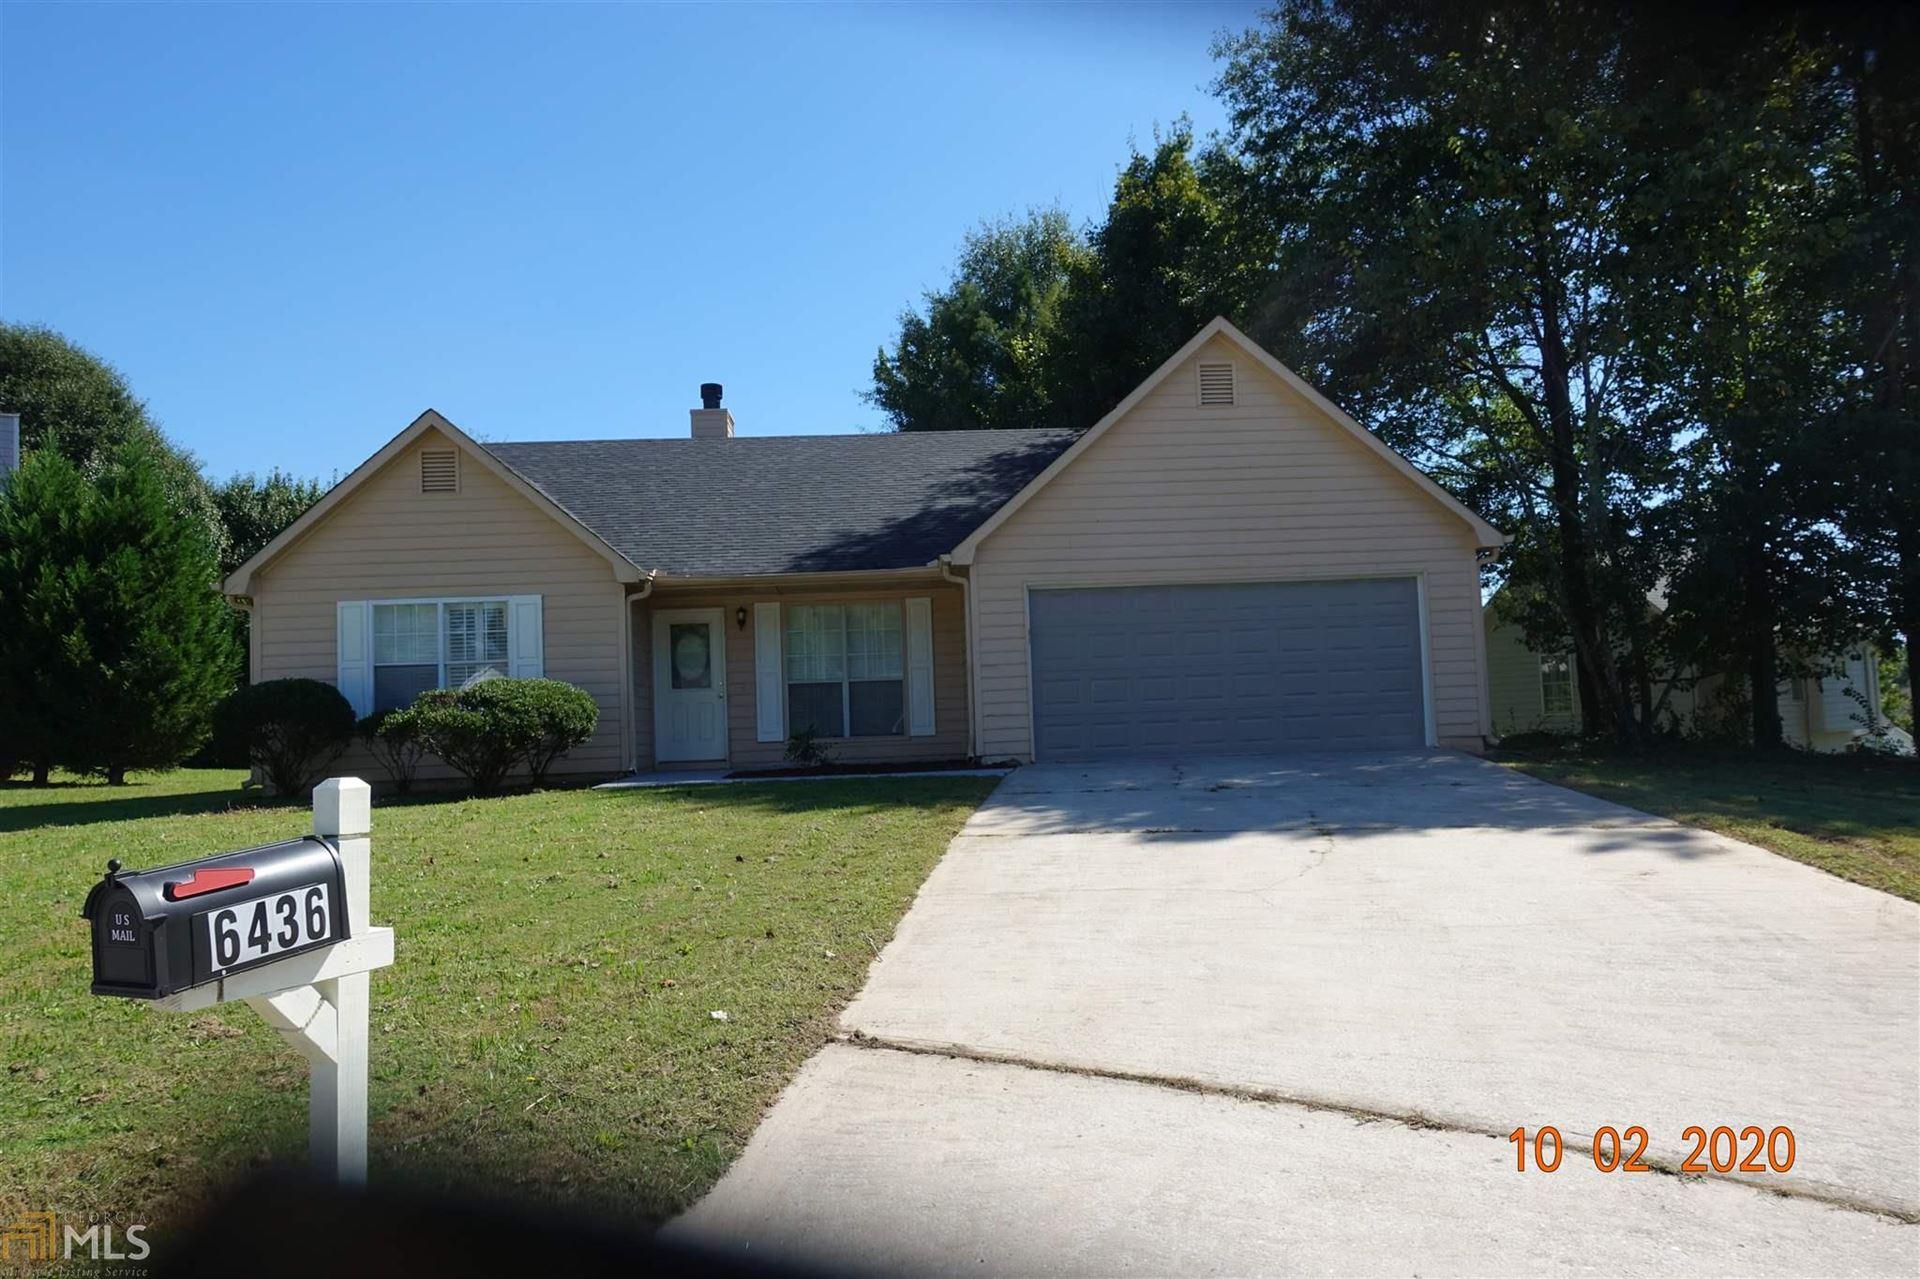 6436 Pine Bark Ct, Morrow, GA 30260 - MLS#: 8868836